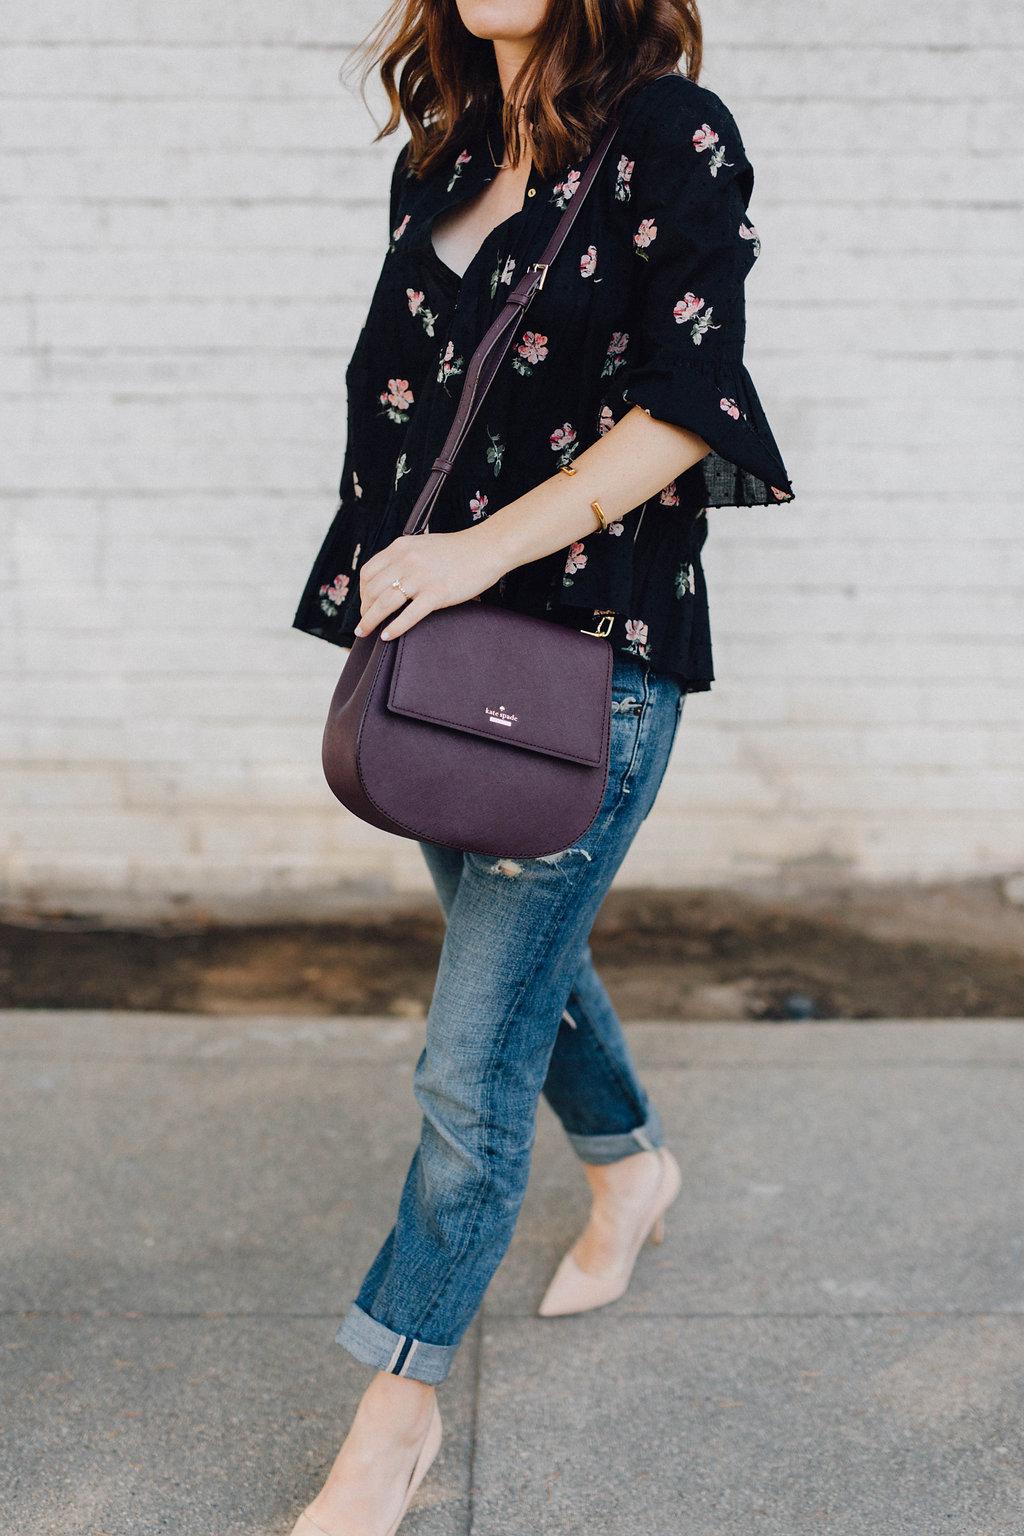 accessory update: burgundy bag